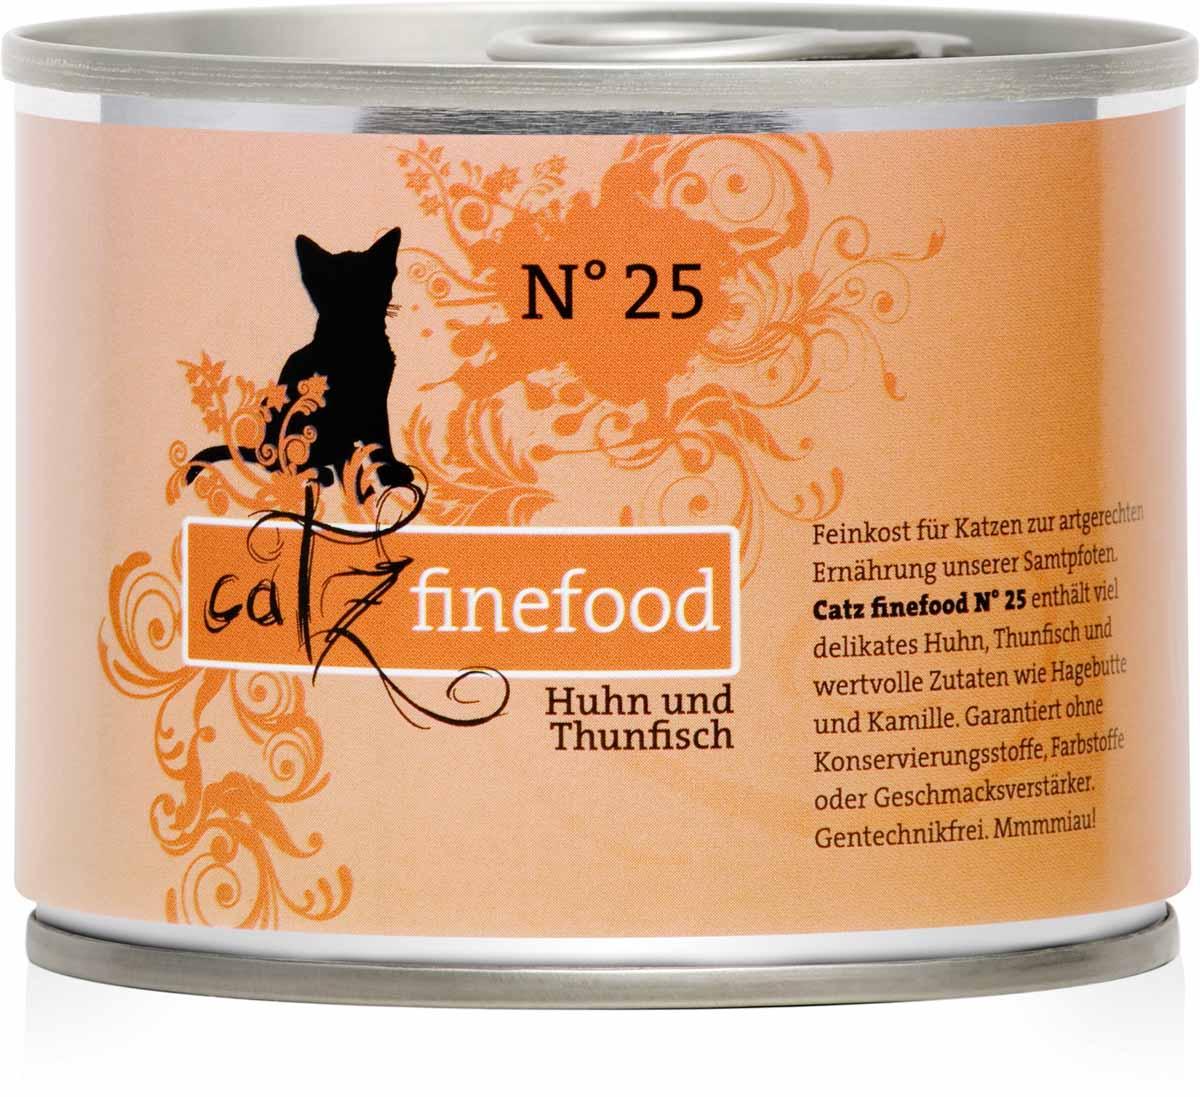 catz finefood no 25 huhn und thunfisch 200g katzenfutter nass katze futtershop24. Black Bedroom Furniture Sets. Home Design Ideas